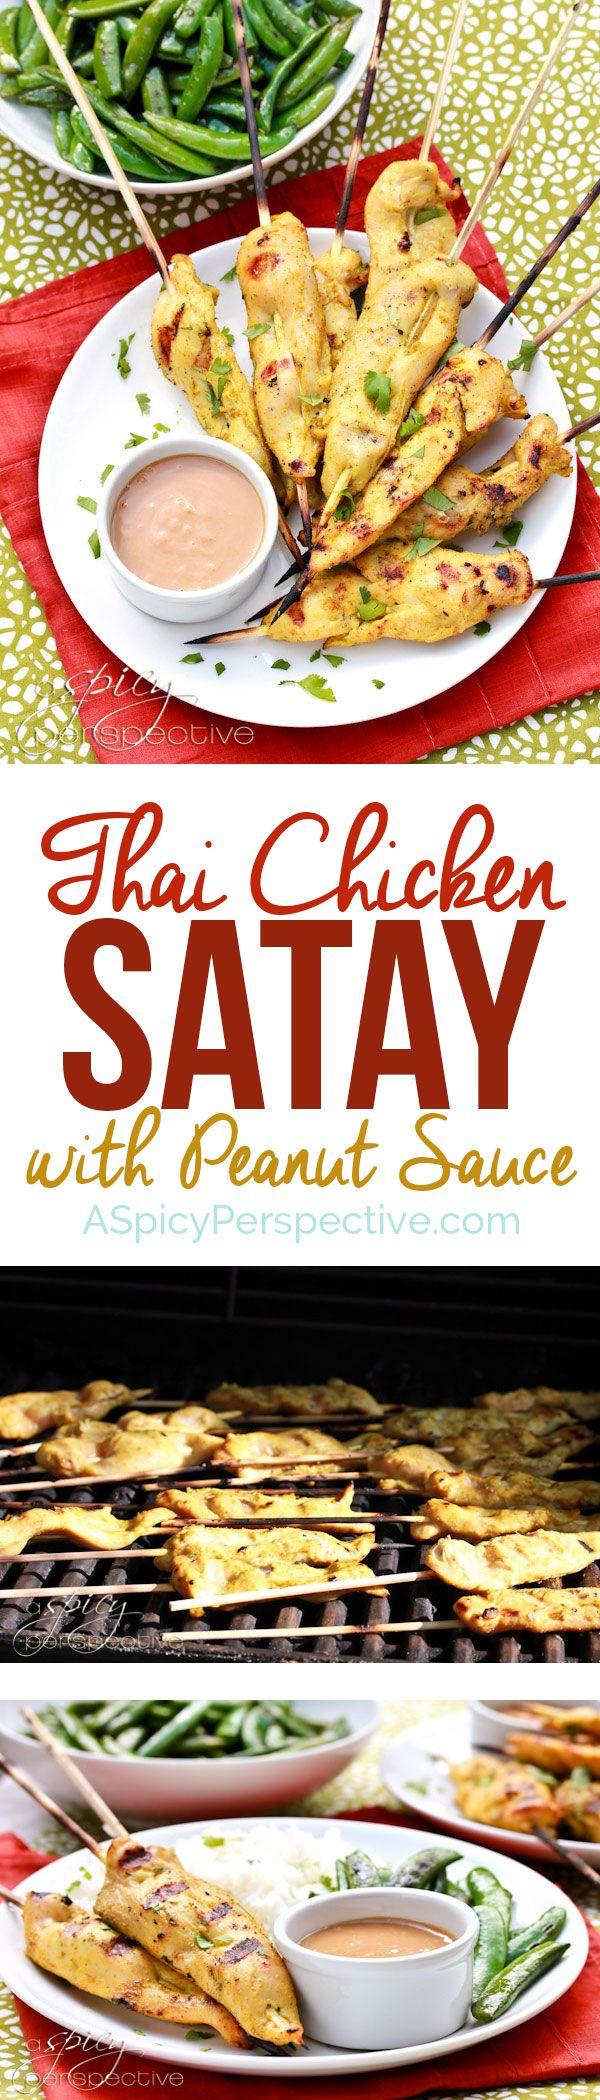 Easy Thai Chicken Satay With Peanut Sauce | ASpicyPerspective.com